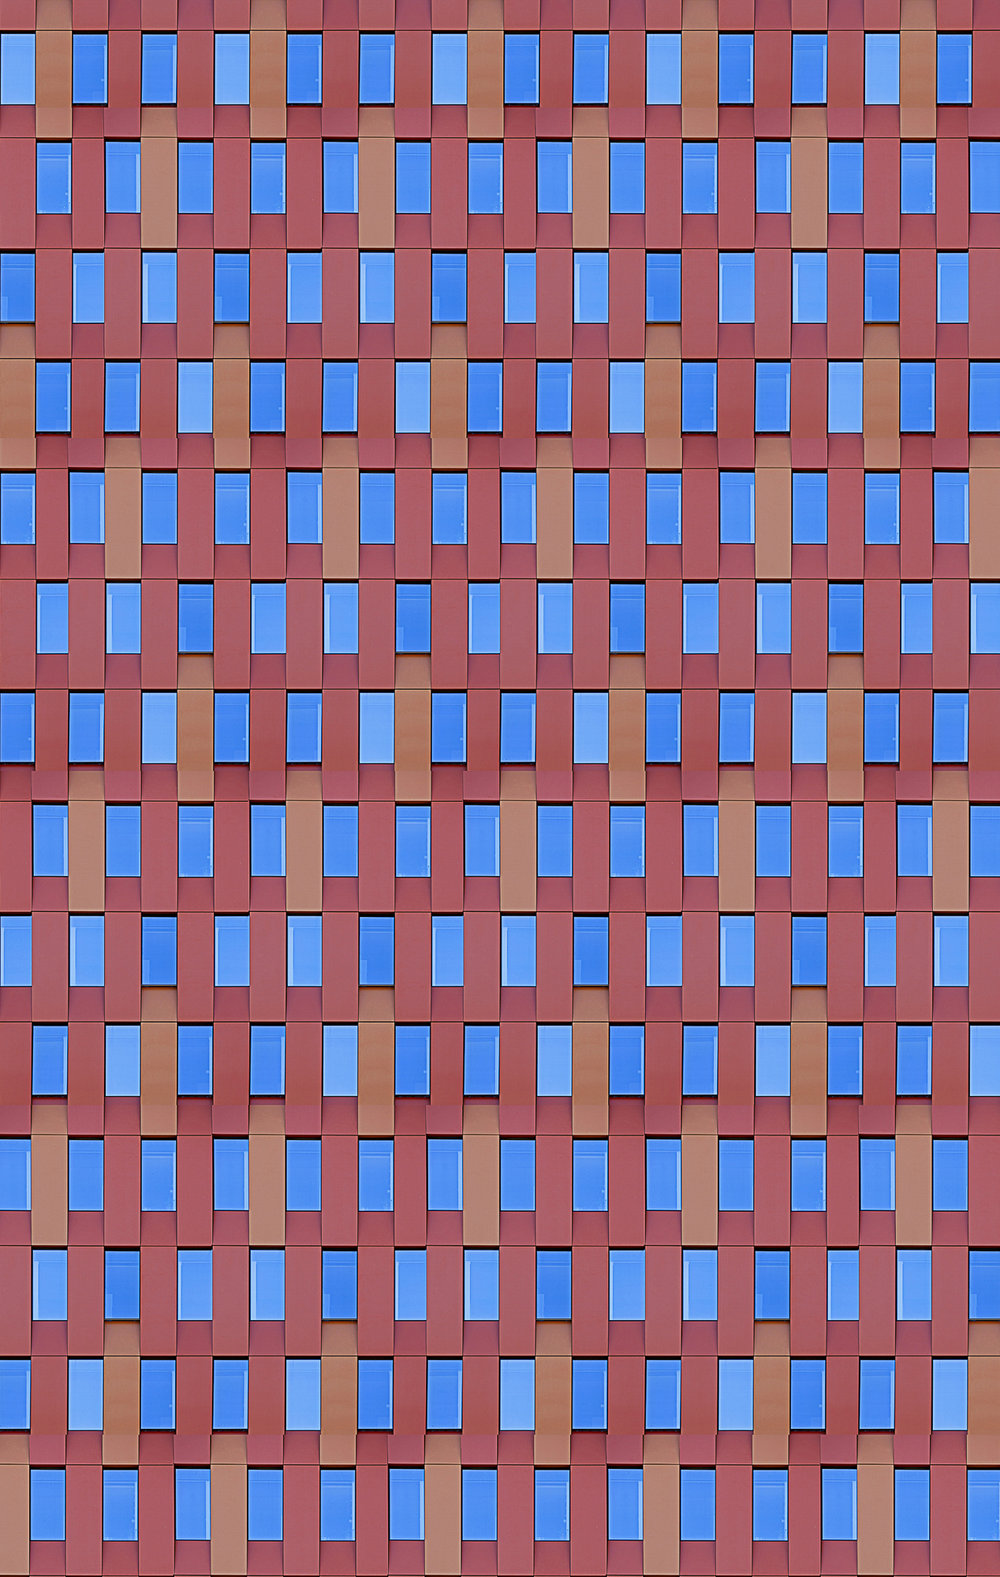 ArchitectureC-AndersonAran-1.jpg